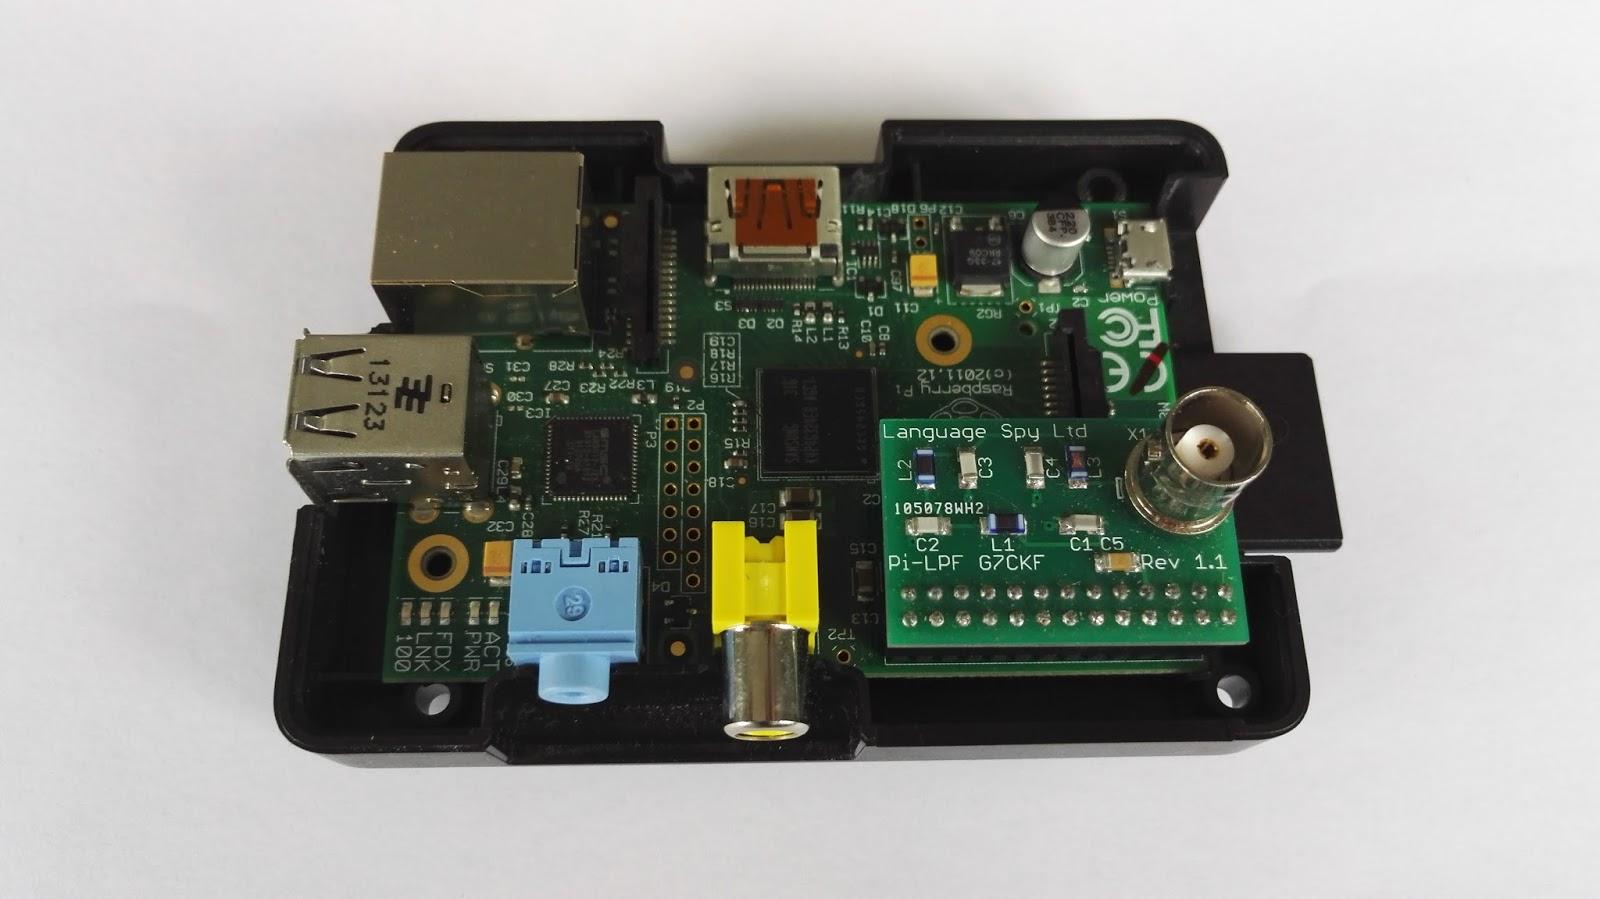 A Slice of Raspberry Pi: Setting up a Raspberry Pi WSPR Station